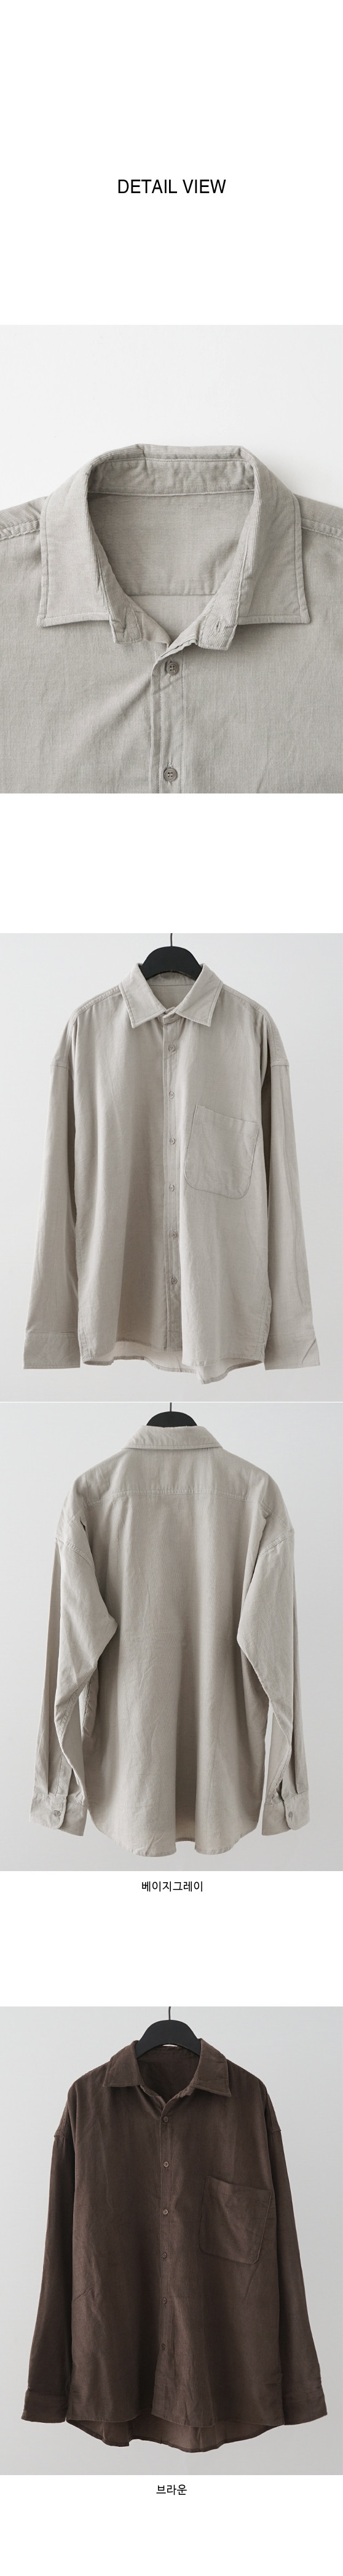 warm corduroy shirt